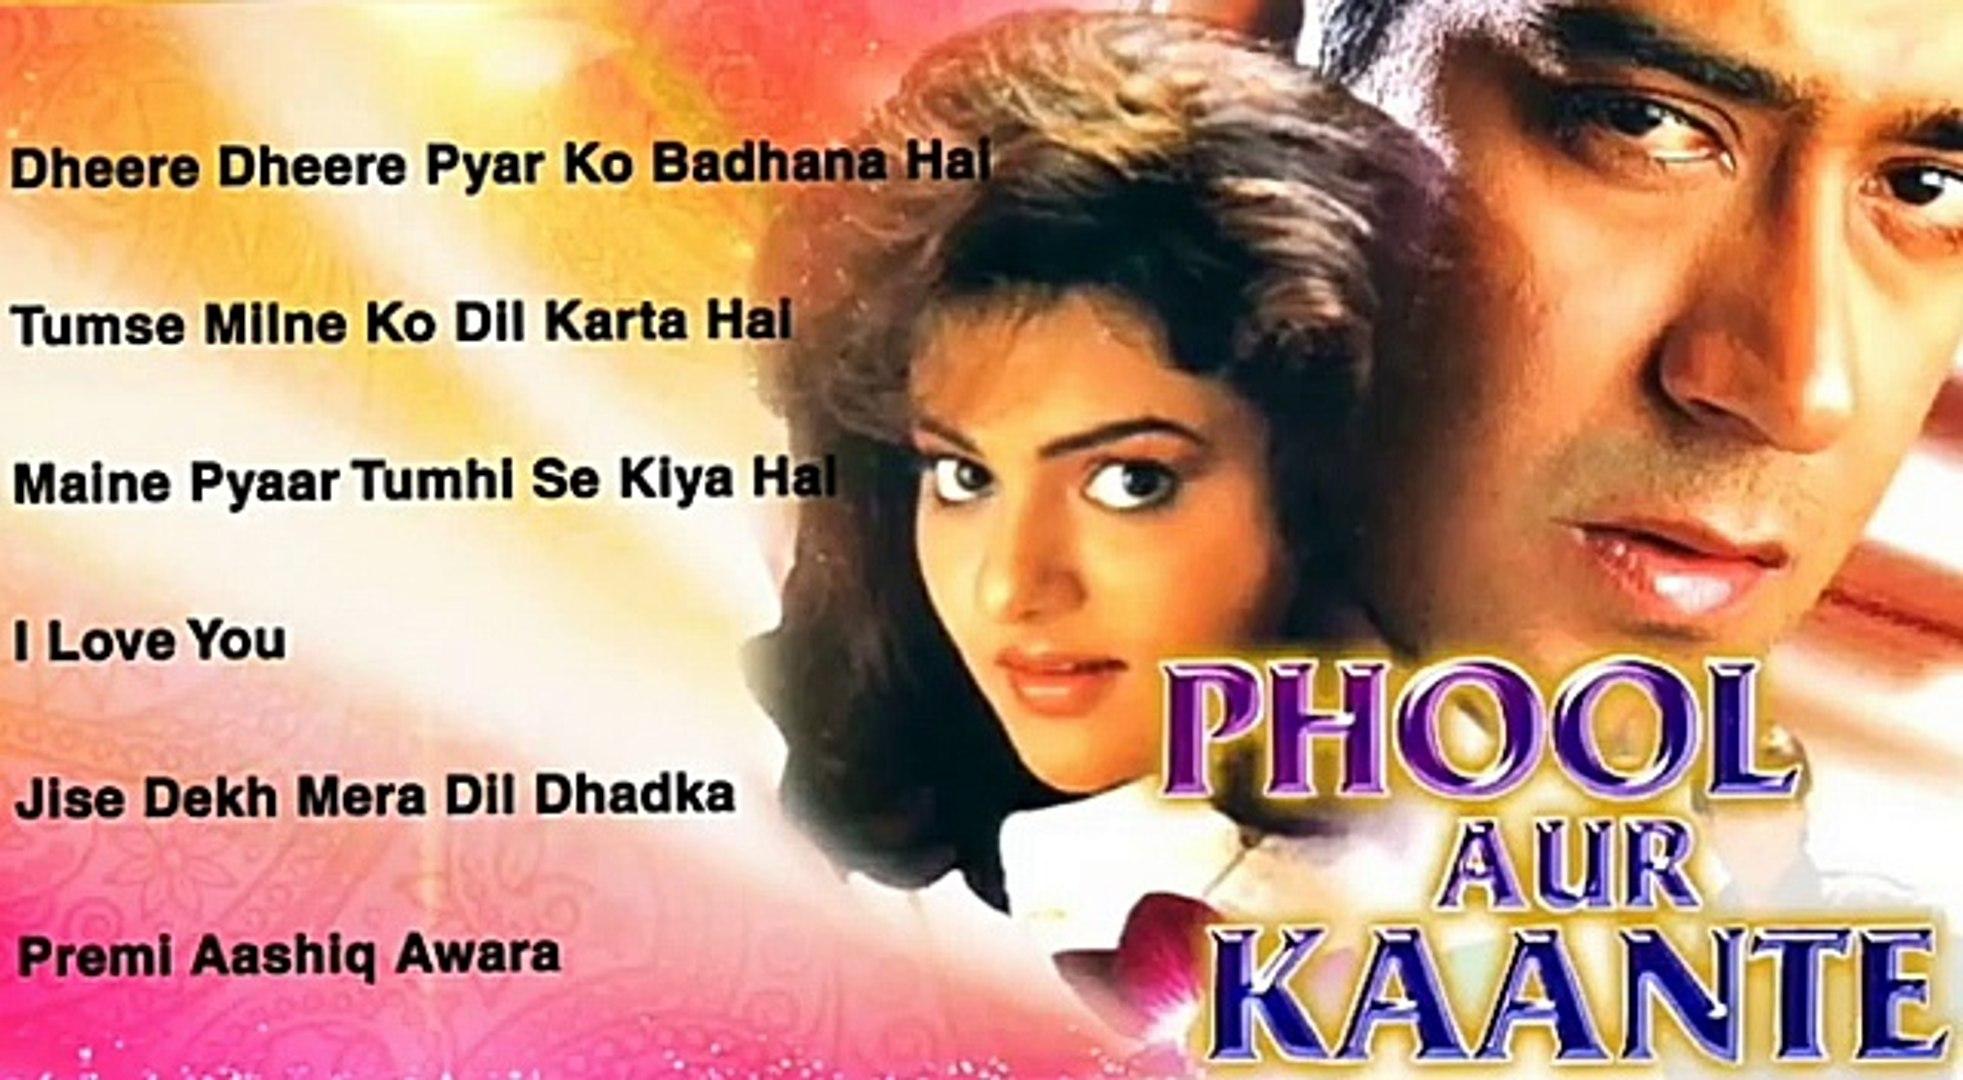 Phool Aur Kaante Movie Song